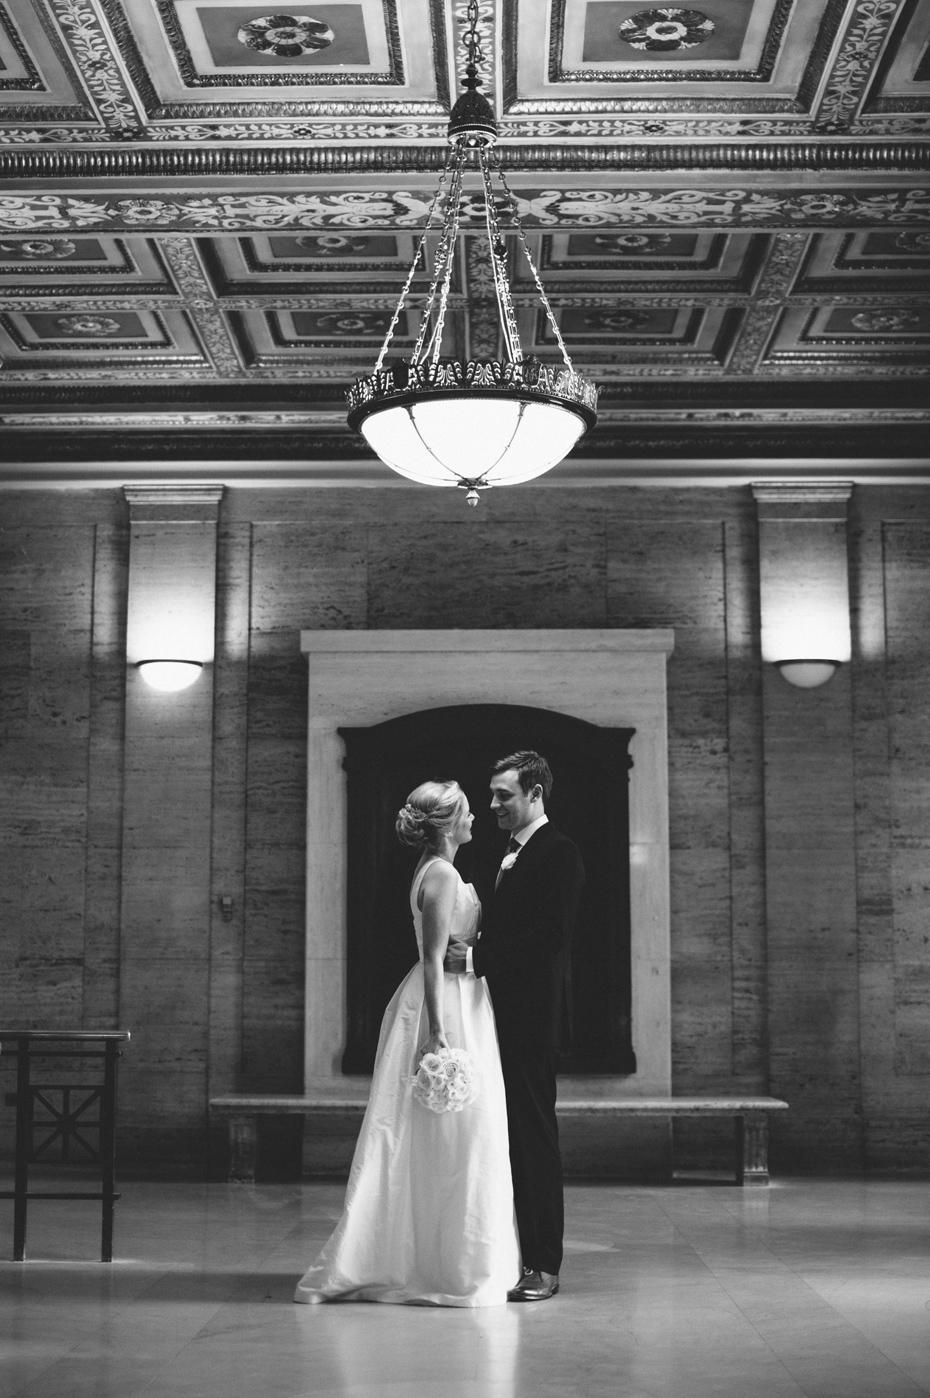 A bride and groom portrait at Angell Hall in Ann Arbor, shot by wedding photographer Heather Jowett